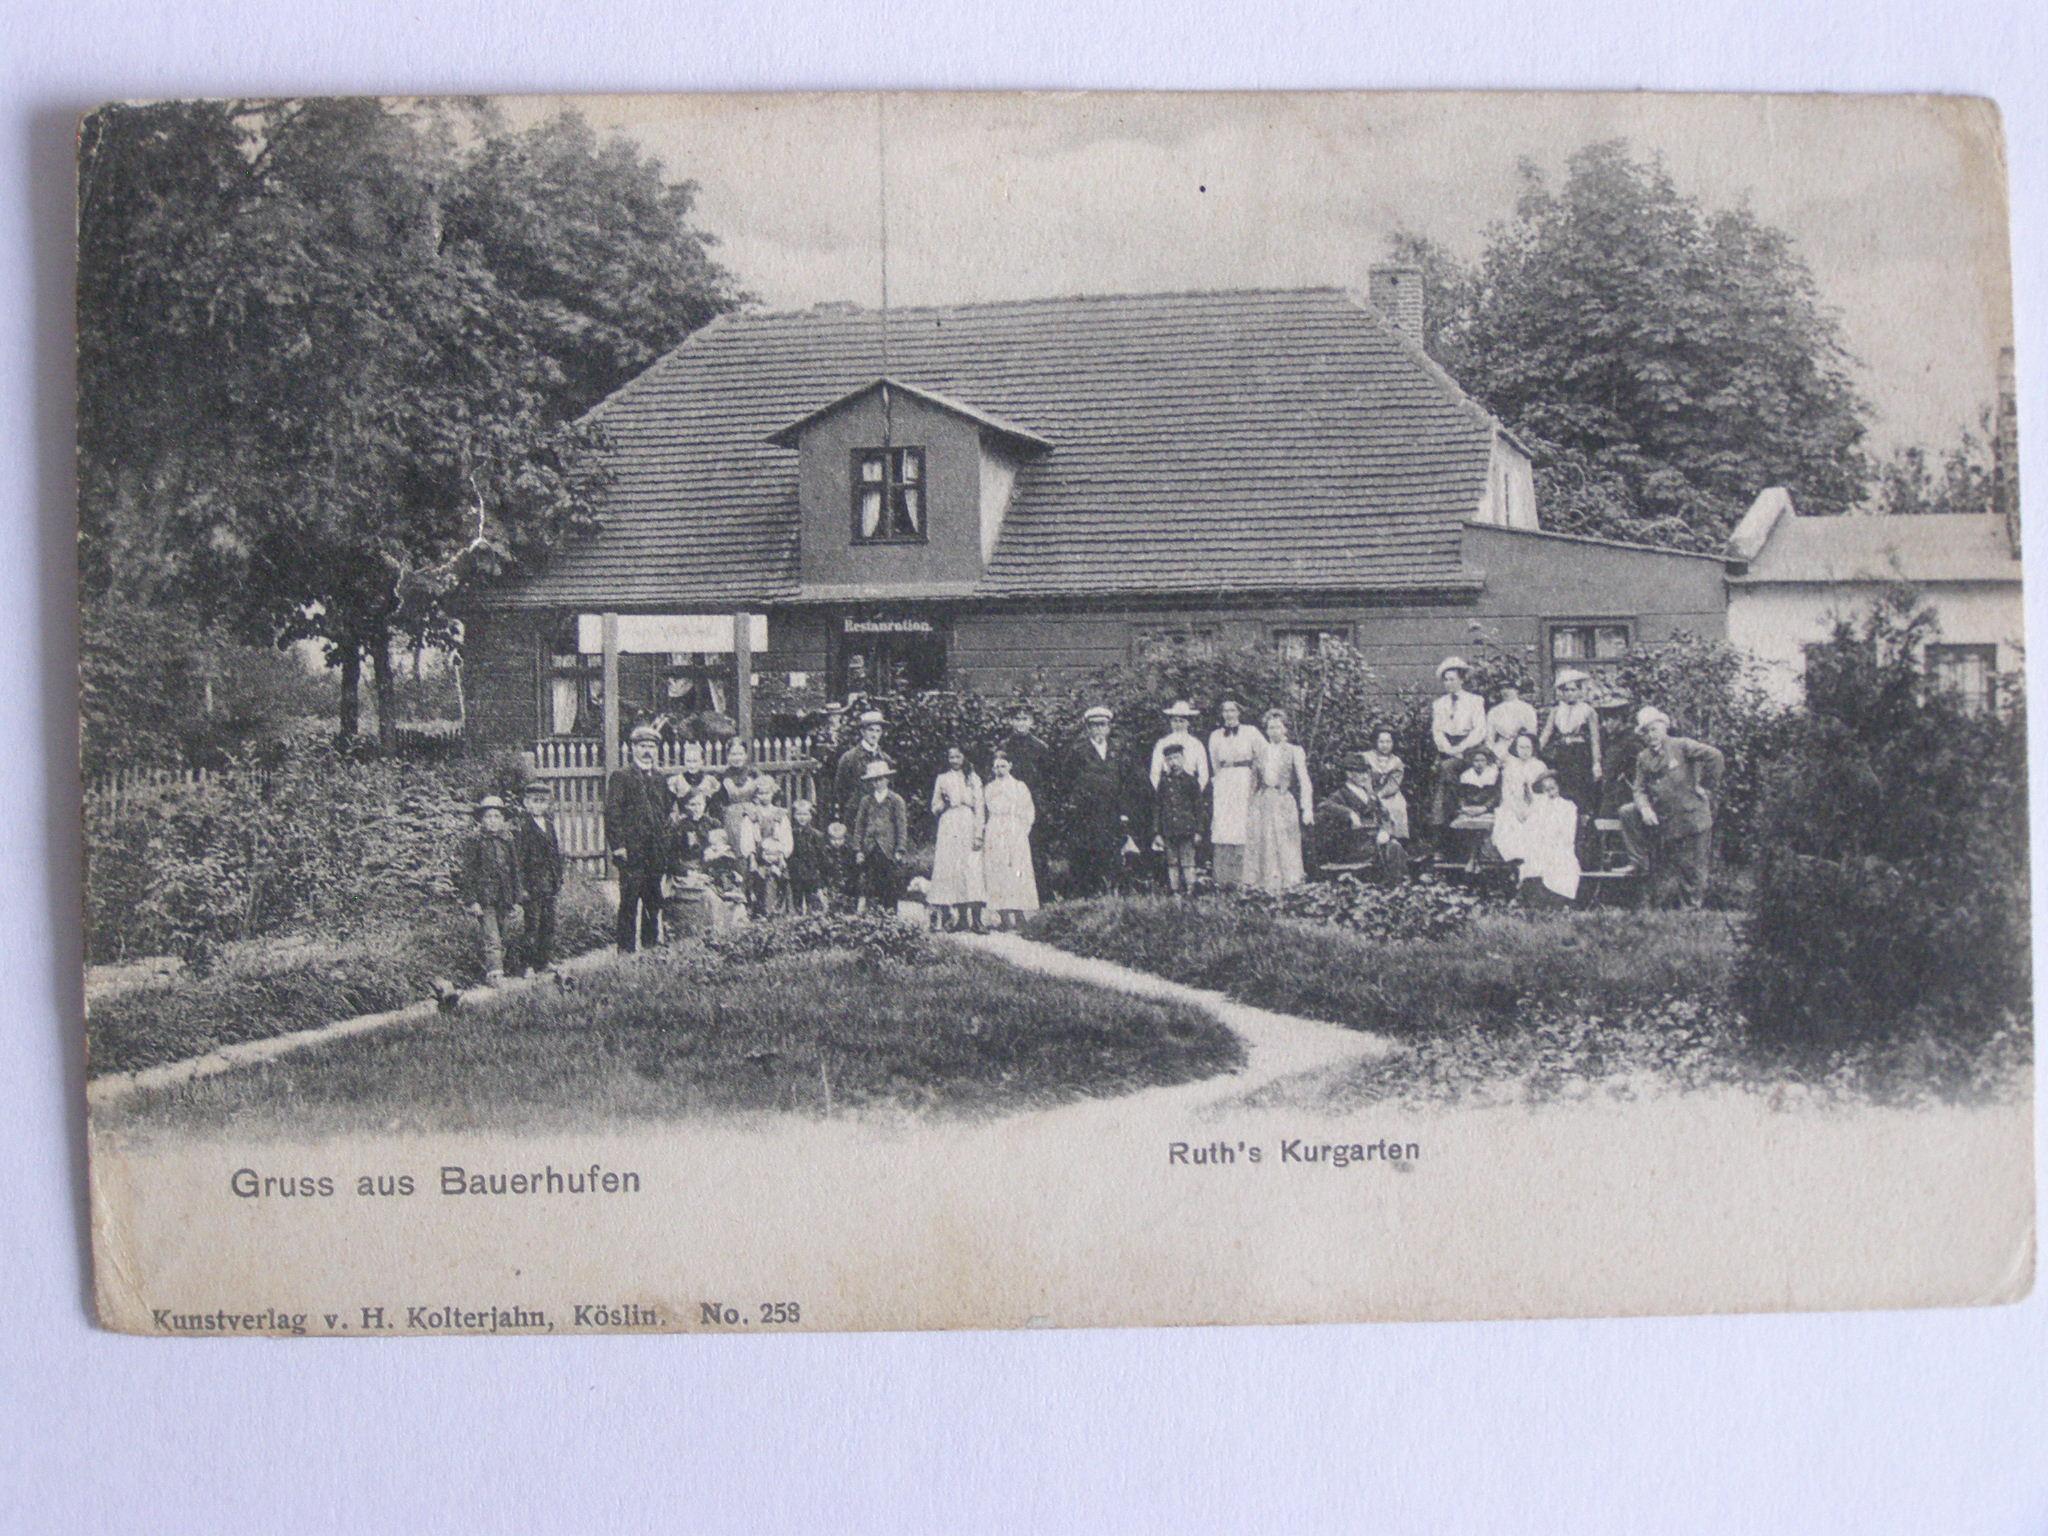 Chłopy Bauerhufen Koszalin hotel Ruths 1905